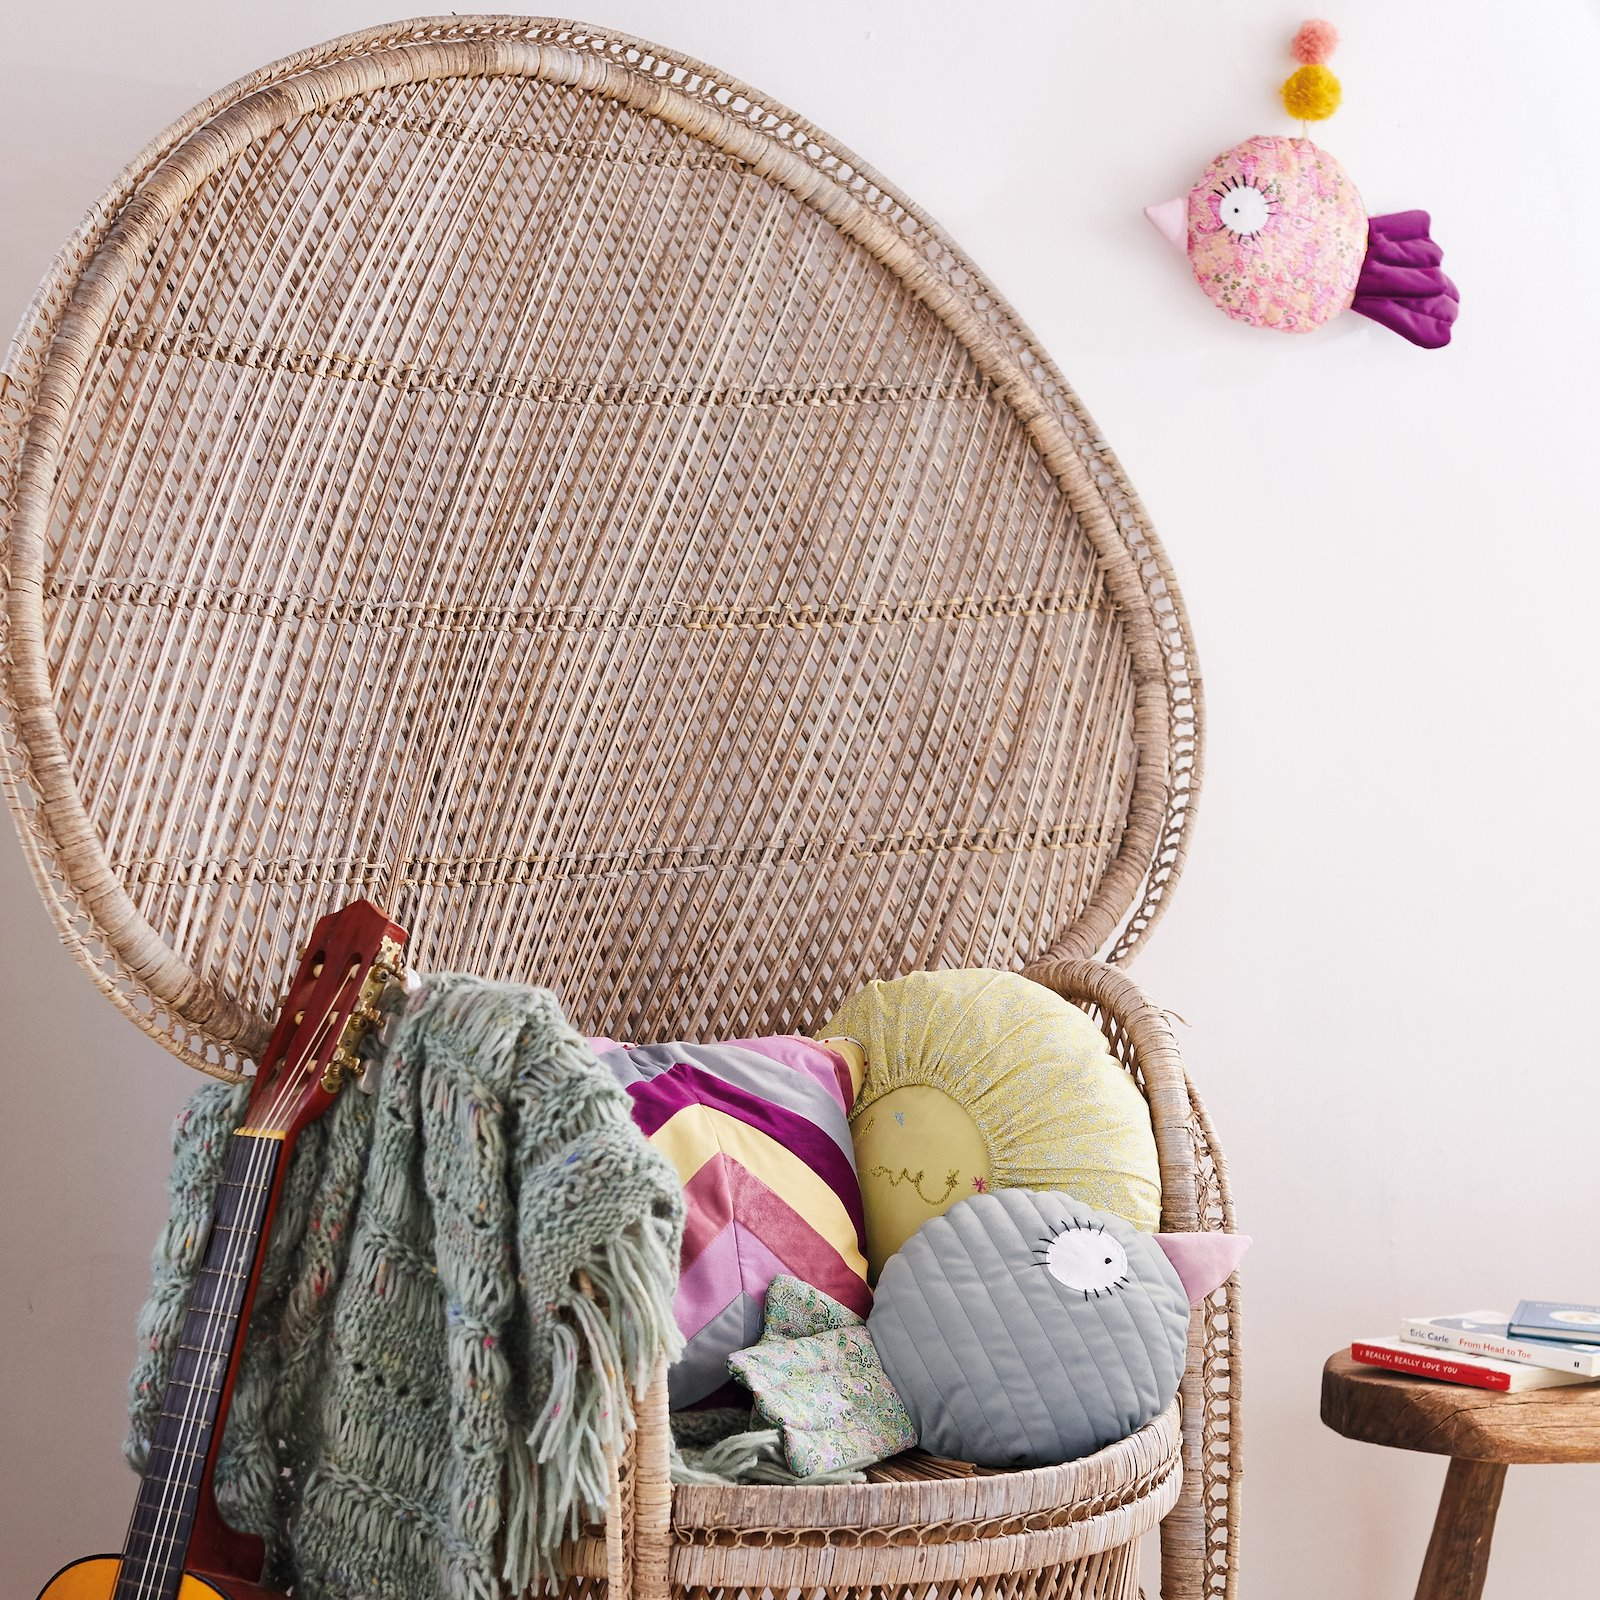 Upholstery shiny velvet pastel blue 823763_824042_4355_823829_71304_p90278_852368_90055106_bundle